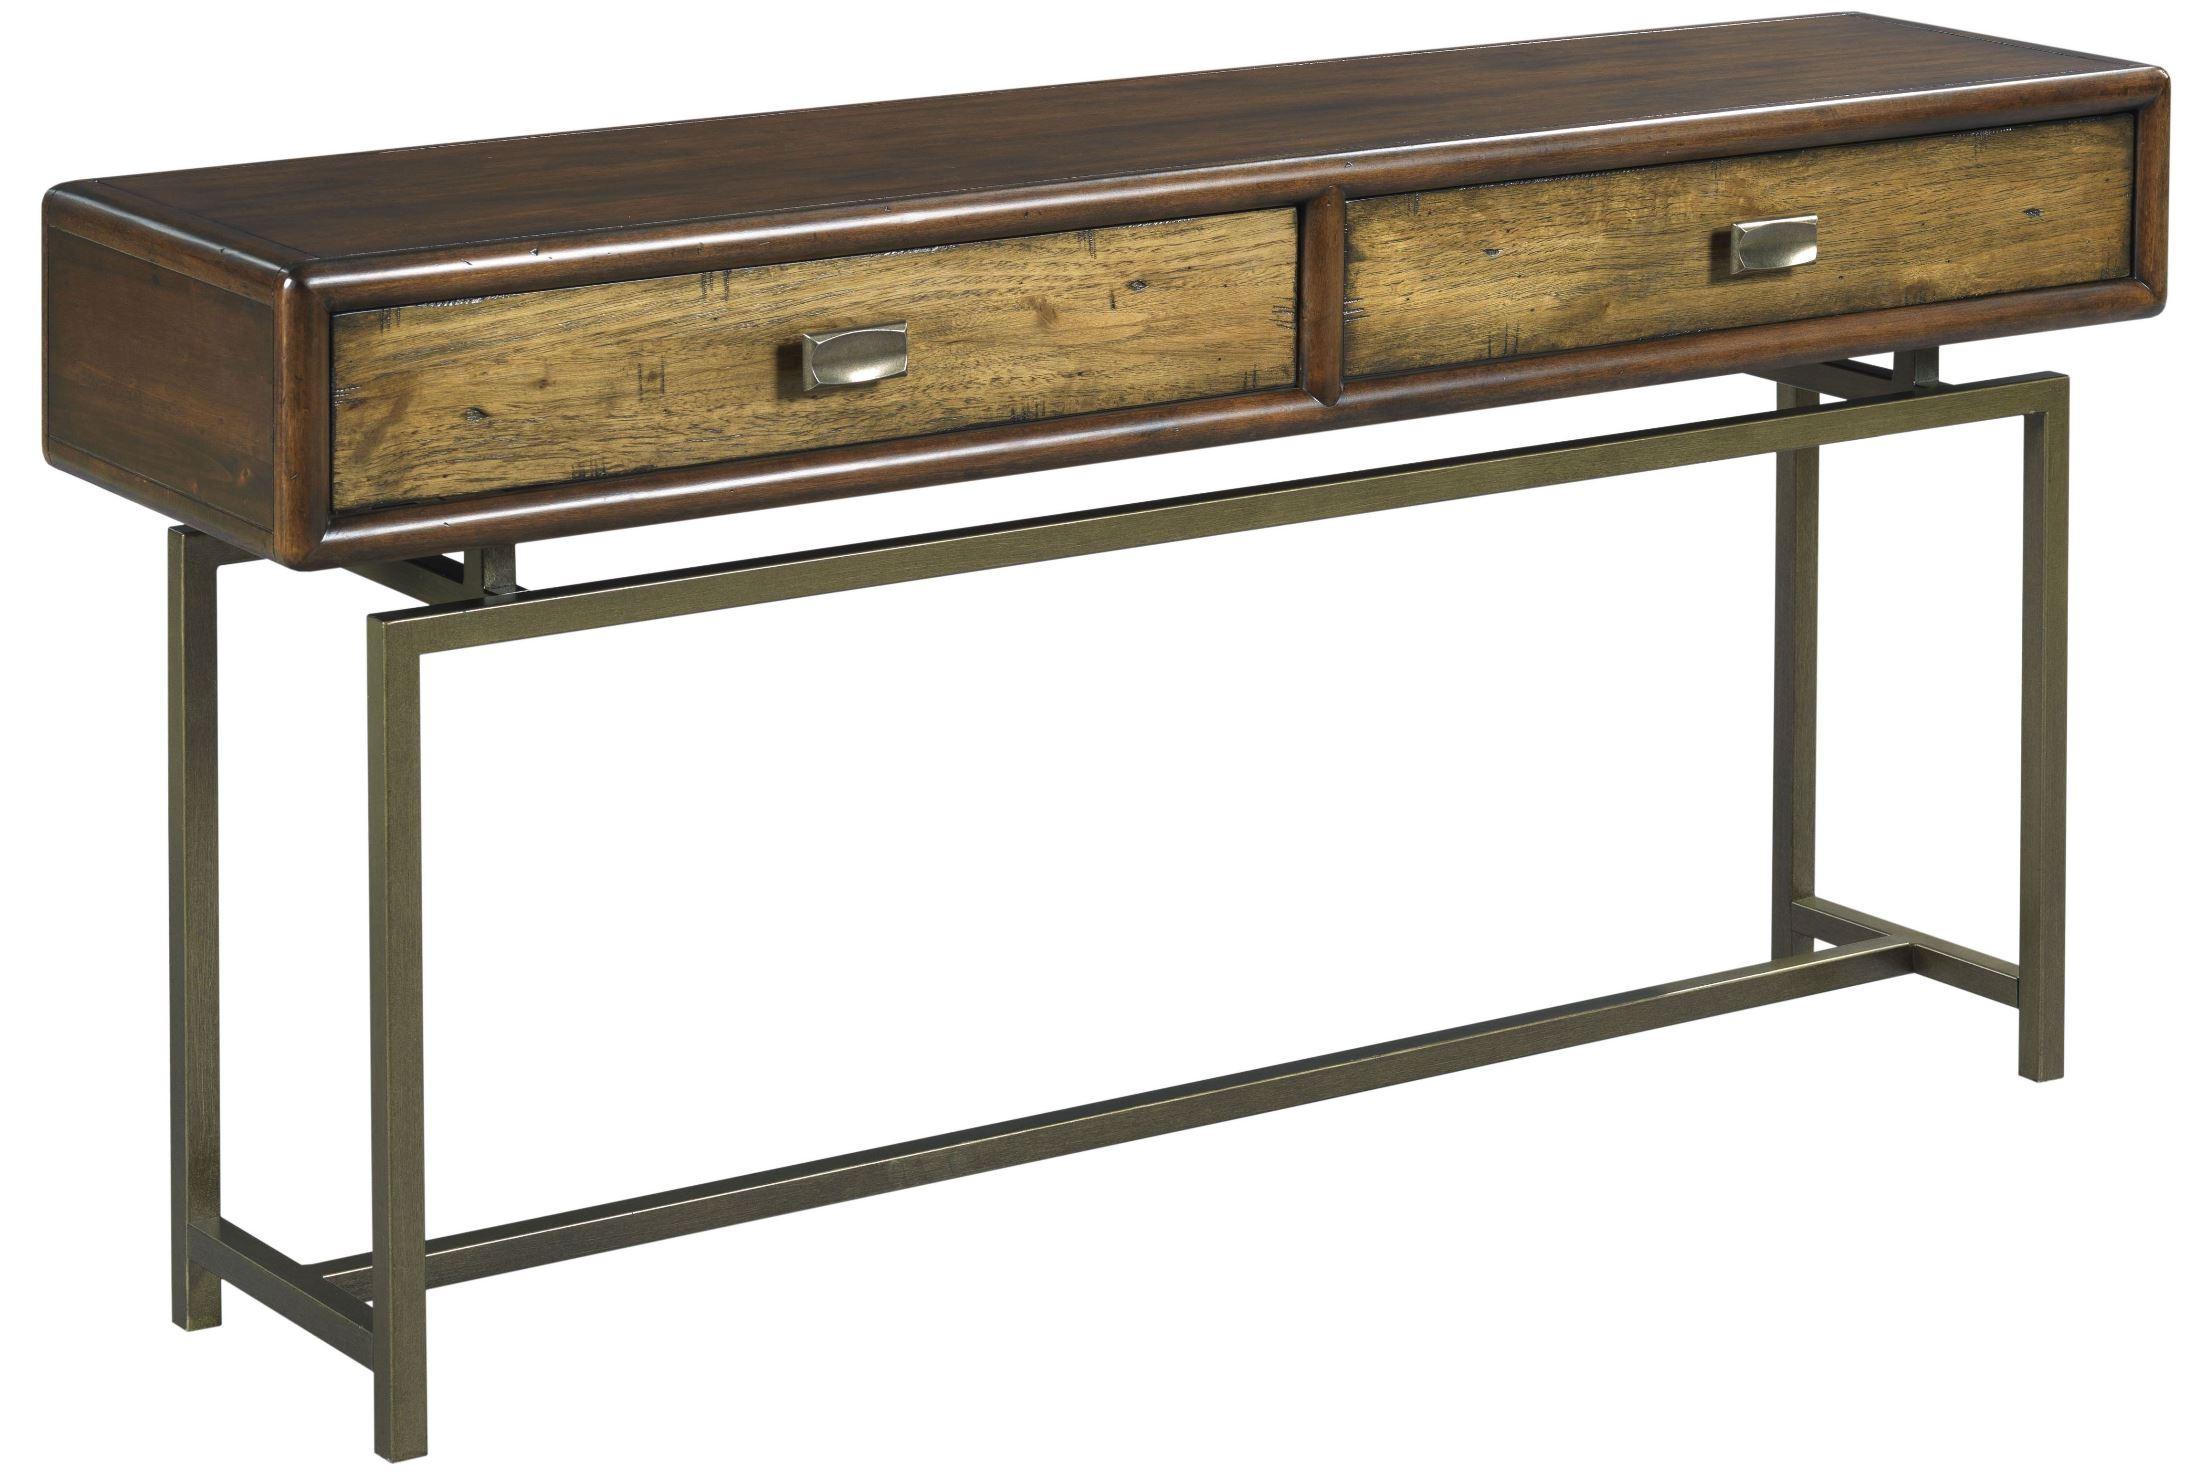 Zodiac warm brown acacia sofa table from hammary 527 925 for 5 sofa table